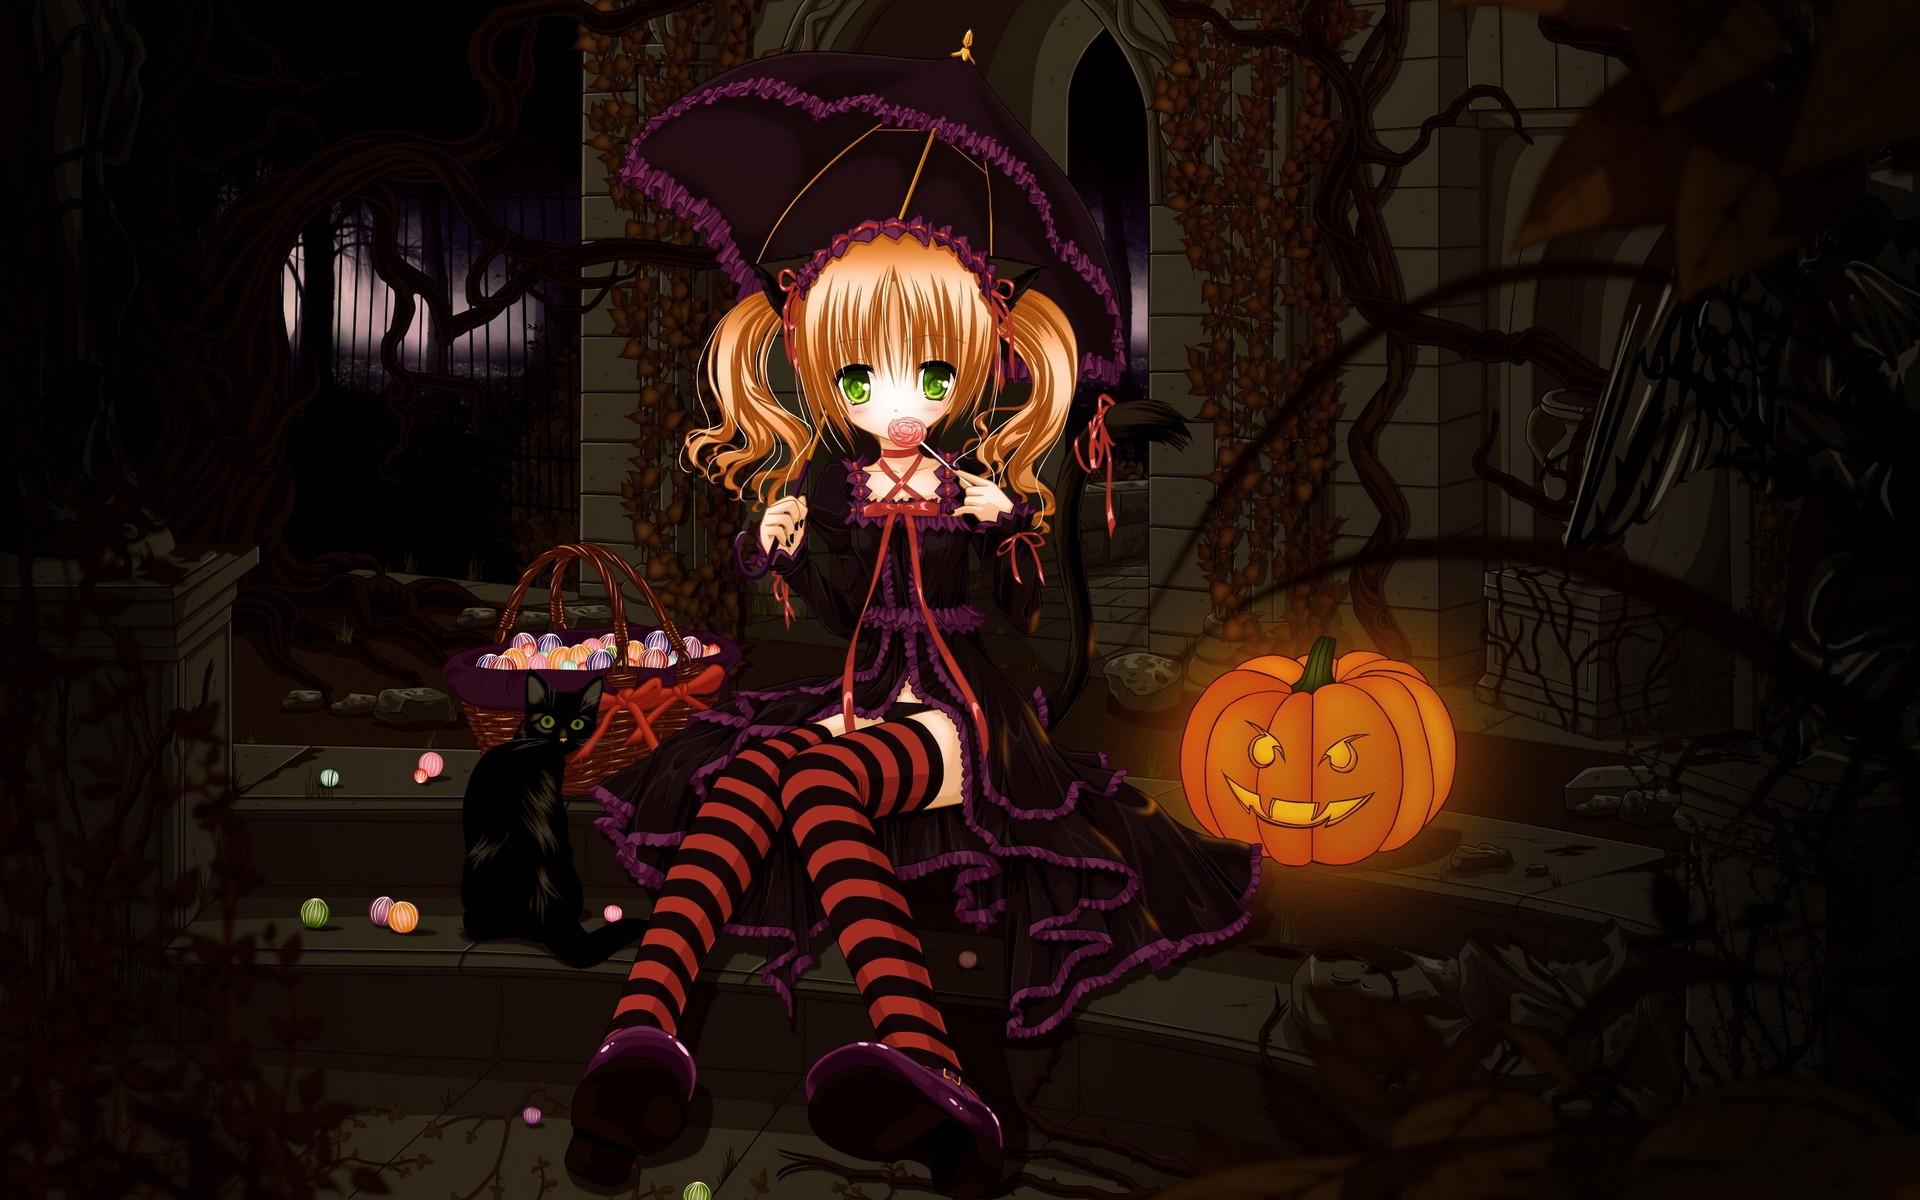 Fondos Android Halloween 2013 (2)